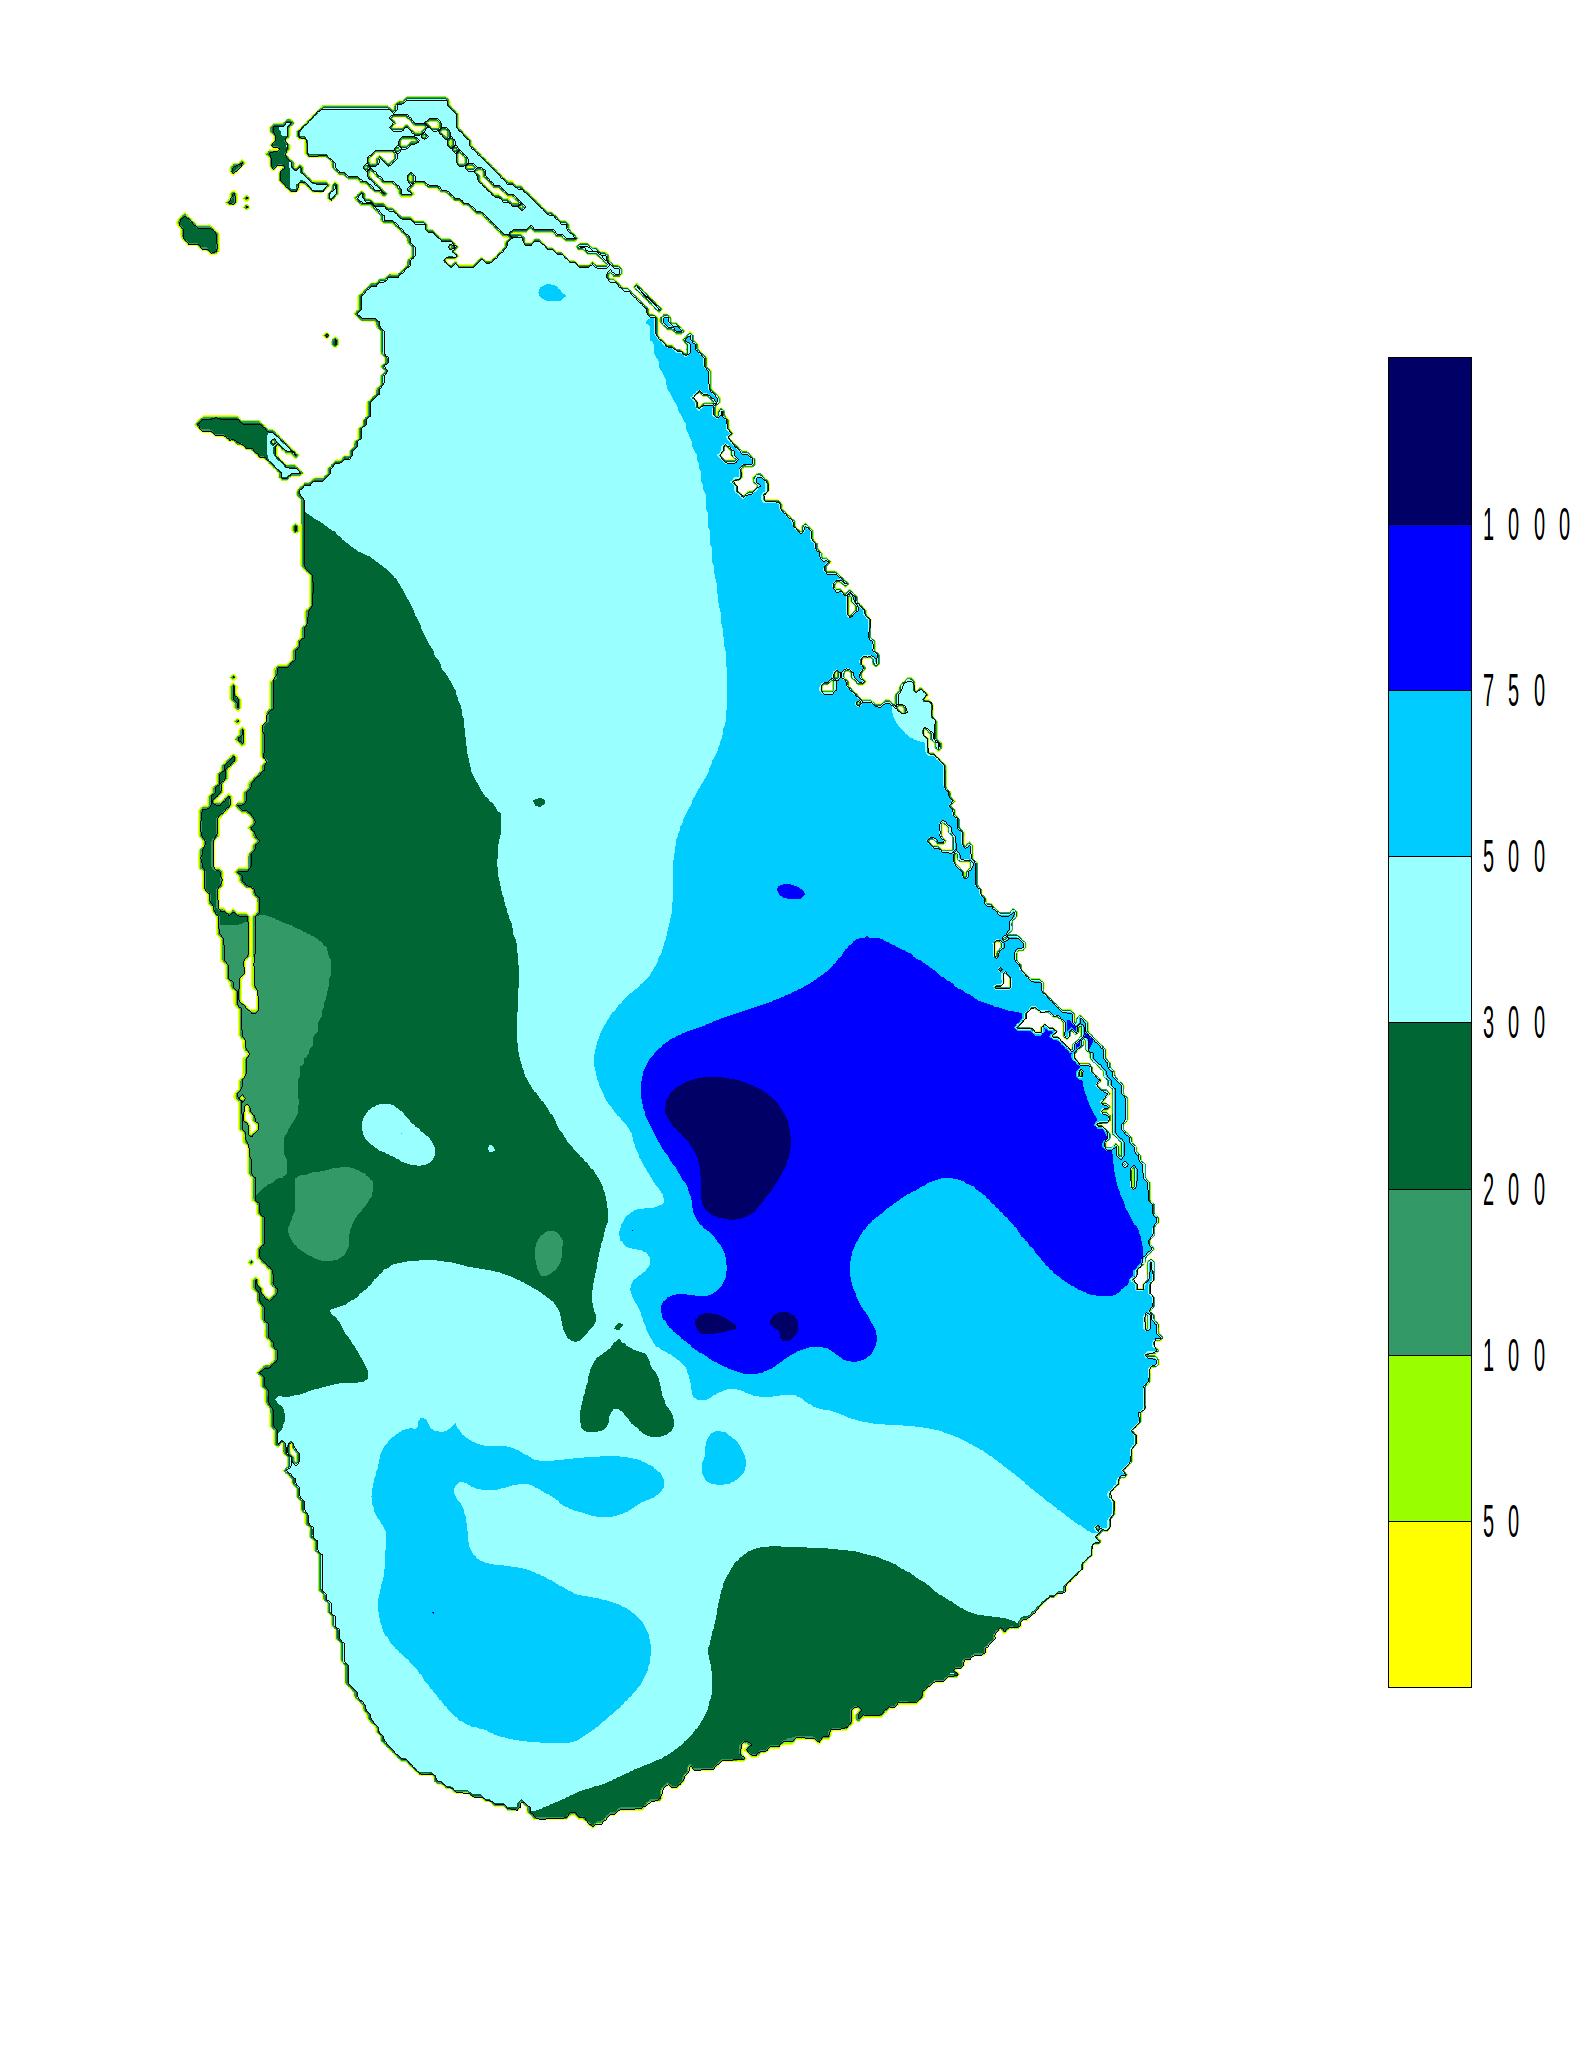 North-East monsoon (Dec-Feb)